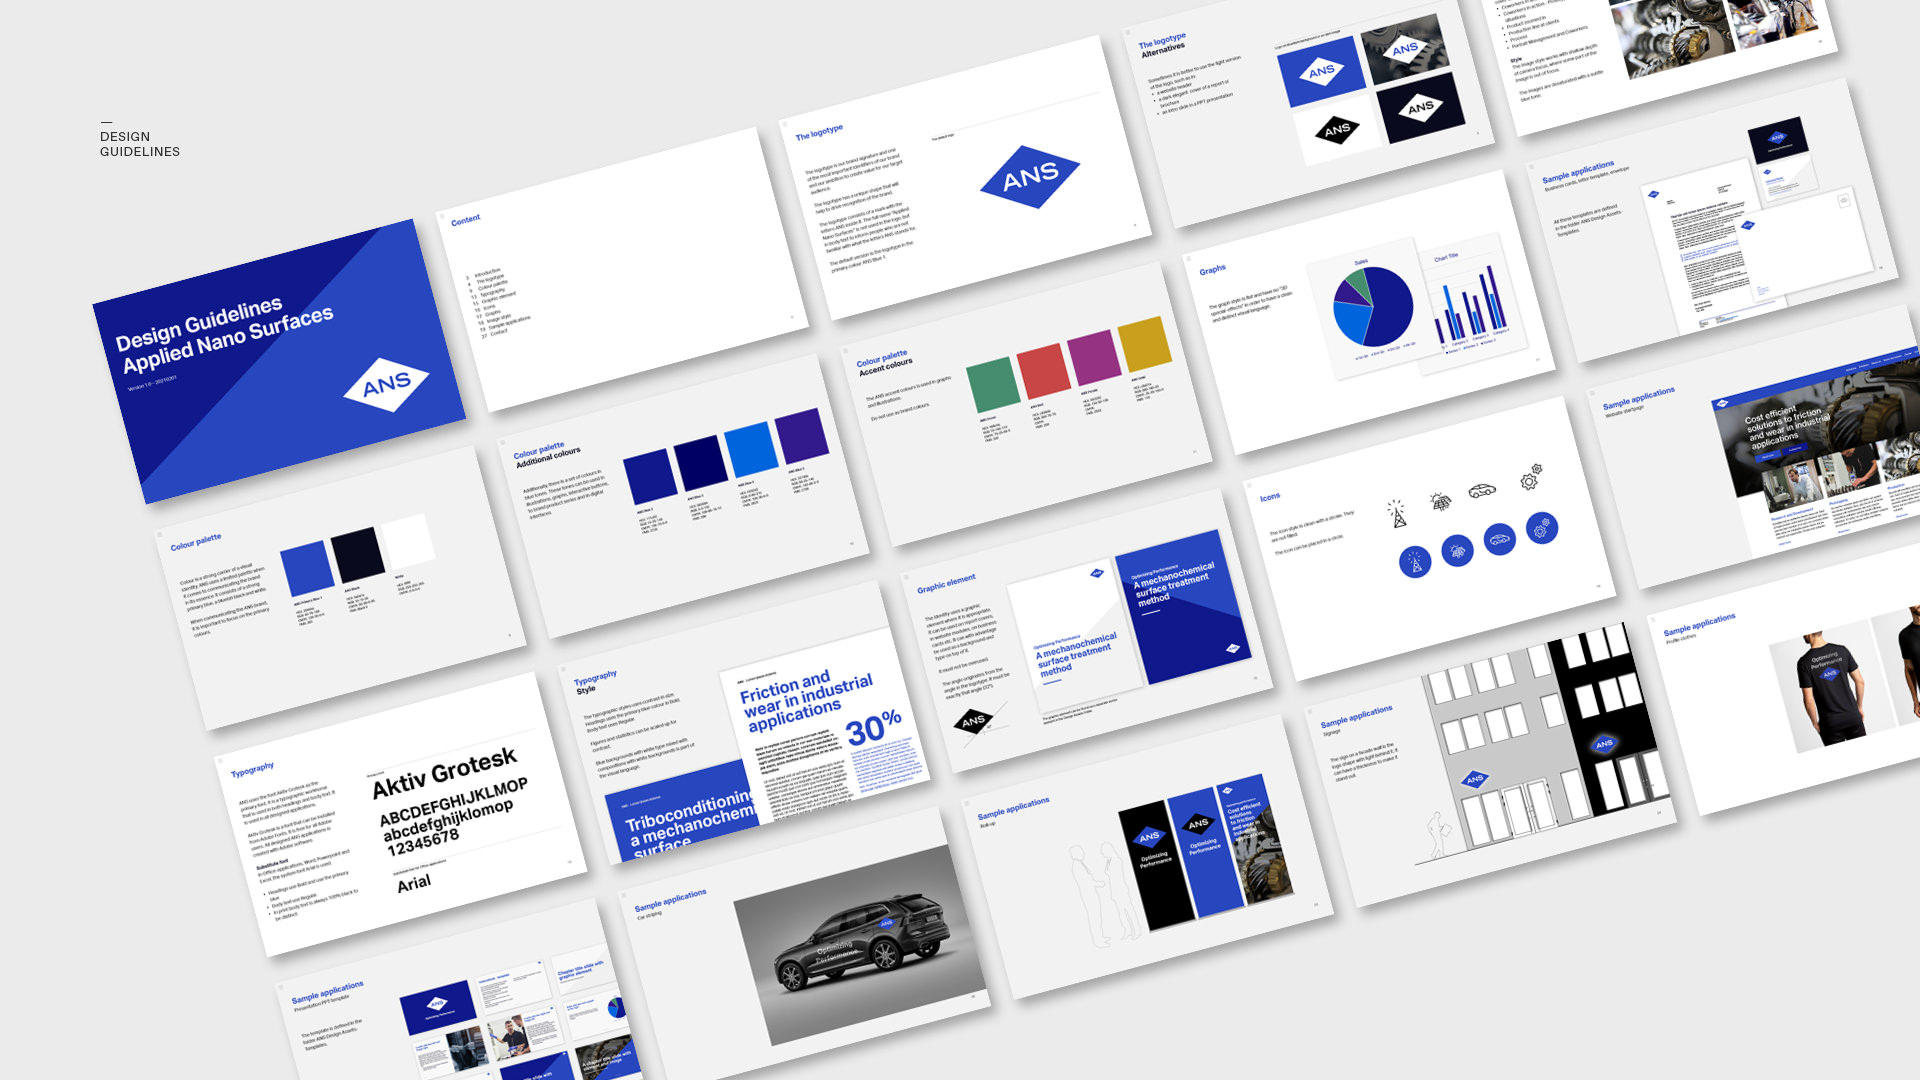 brand-guidelines-design-ans